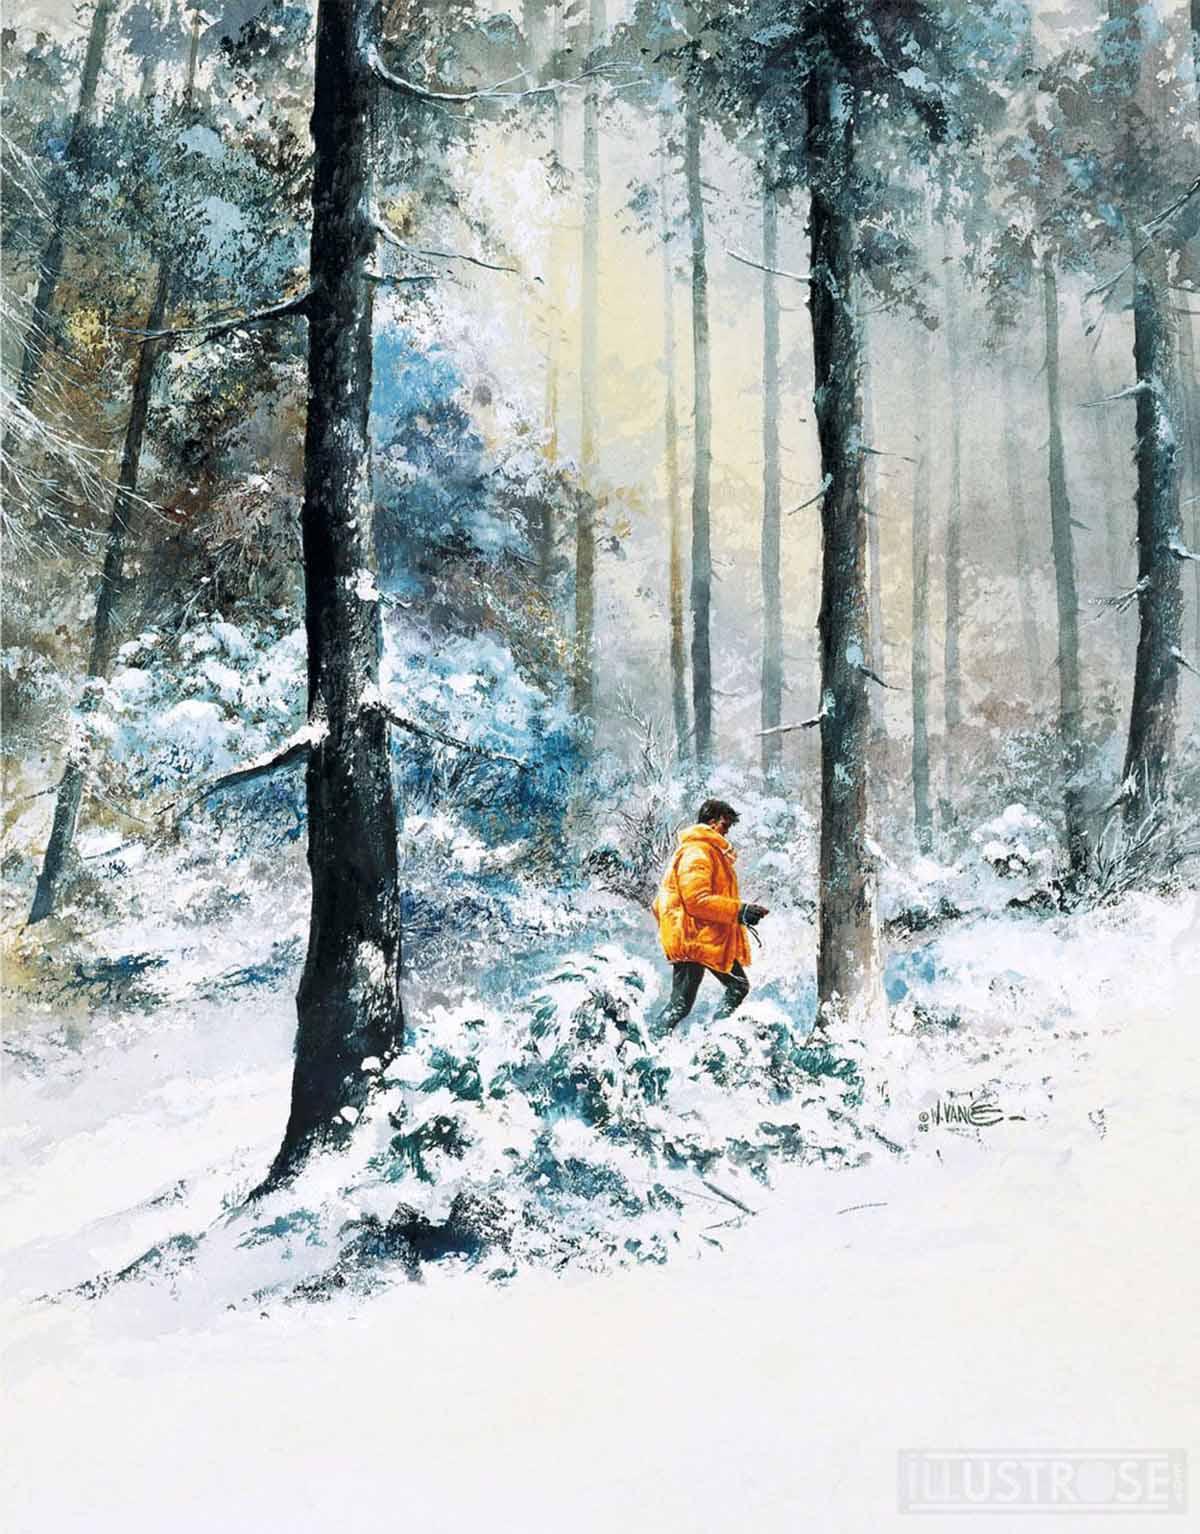 Toile BD décorative XIII de William Vance 'Là où va l'indien' - Illustrose